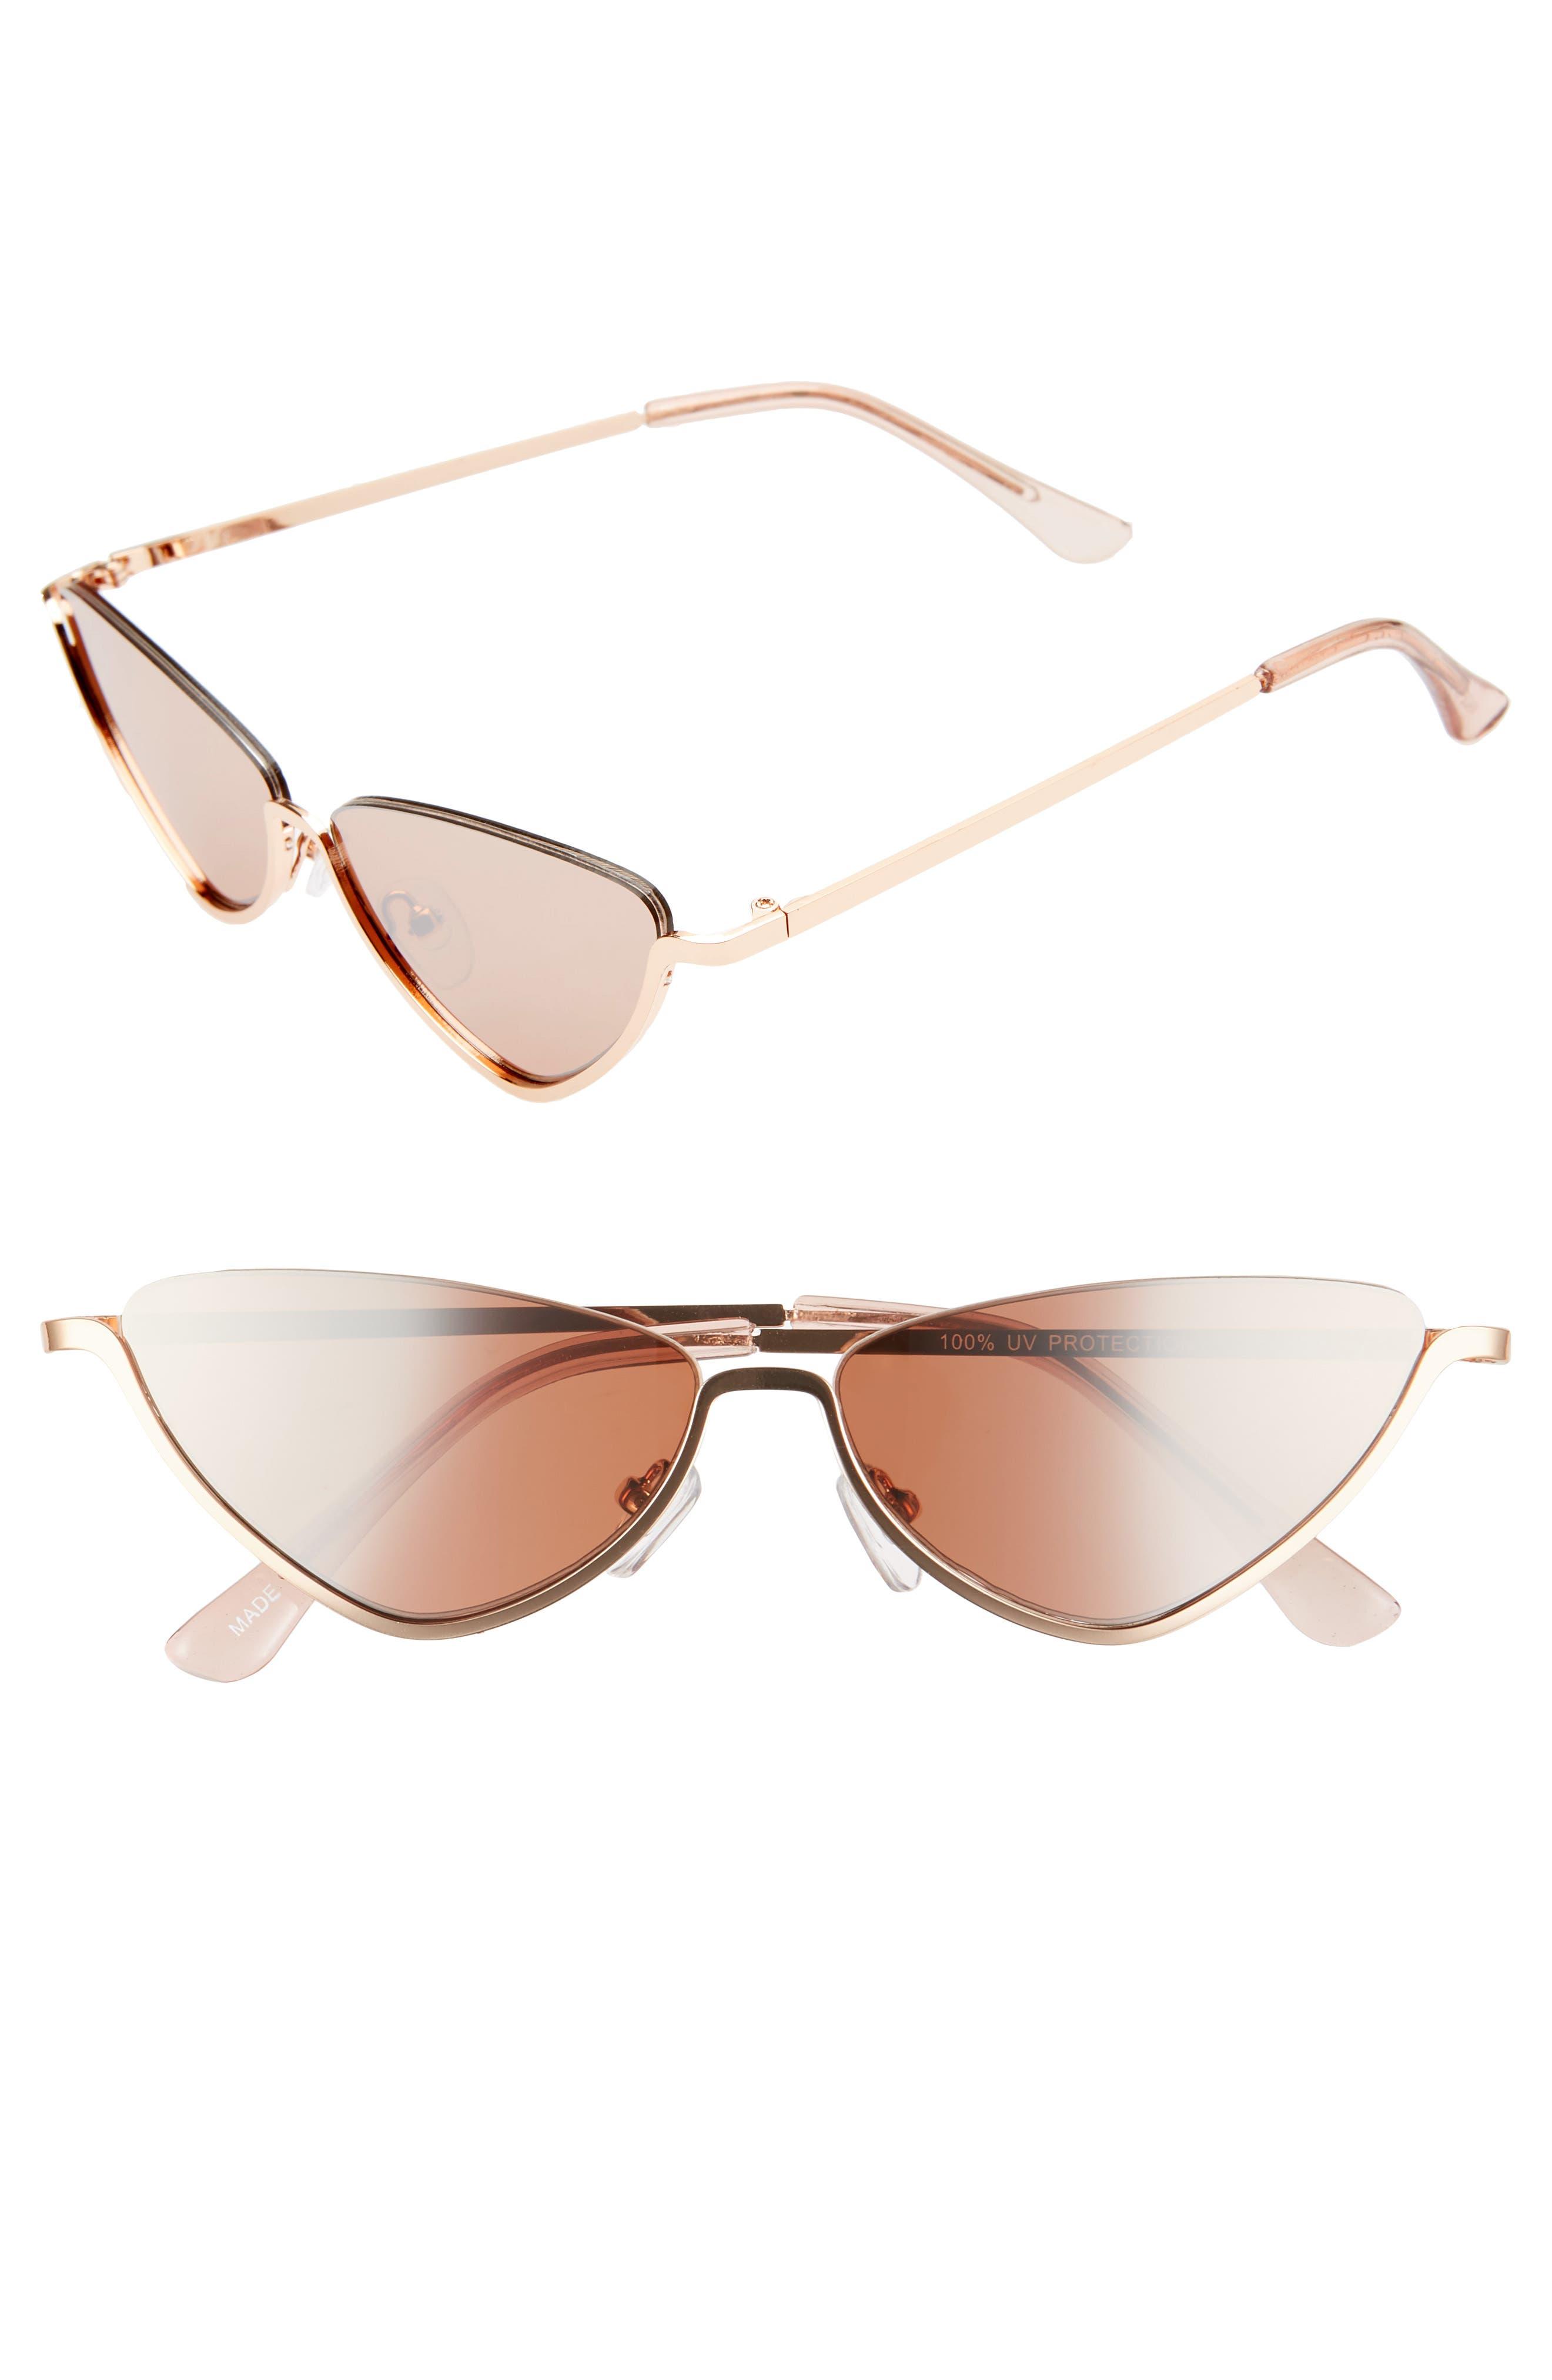 e5fc8d87b6377 Leith 52Mm Semi Rimless Cat Eye Sunglasses - Gold rose Gold